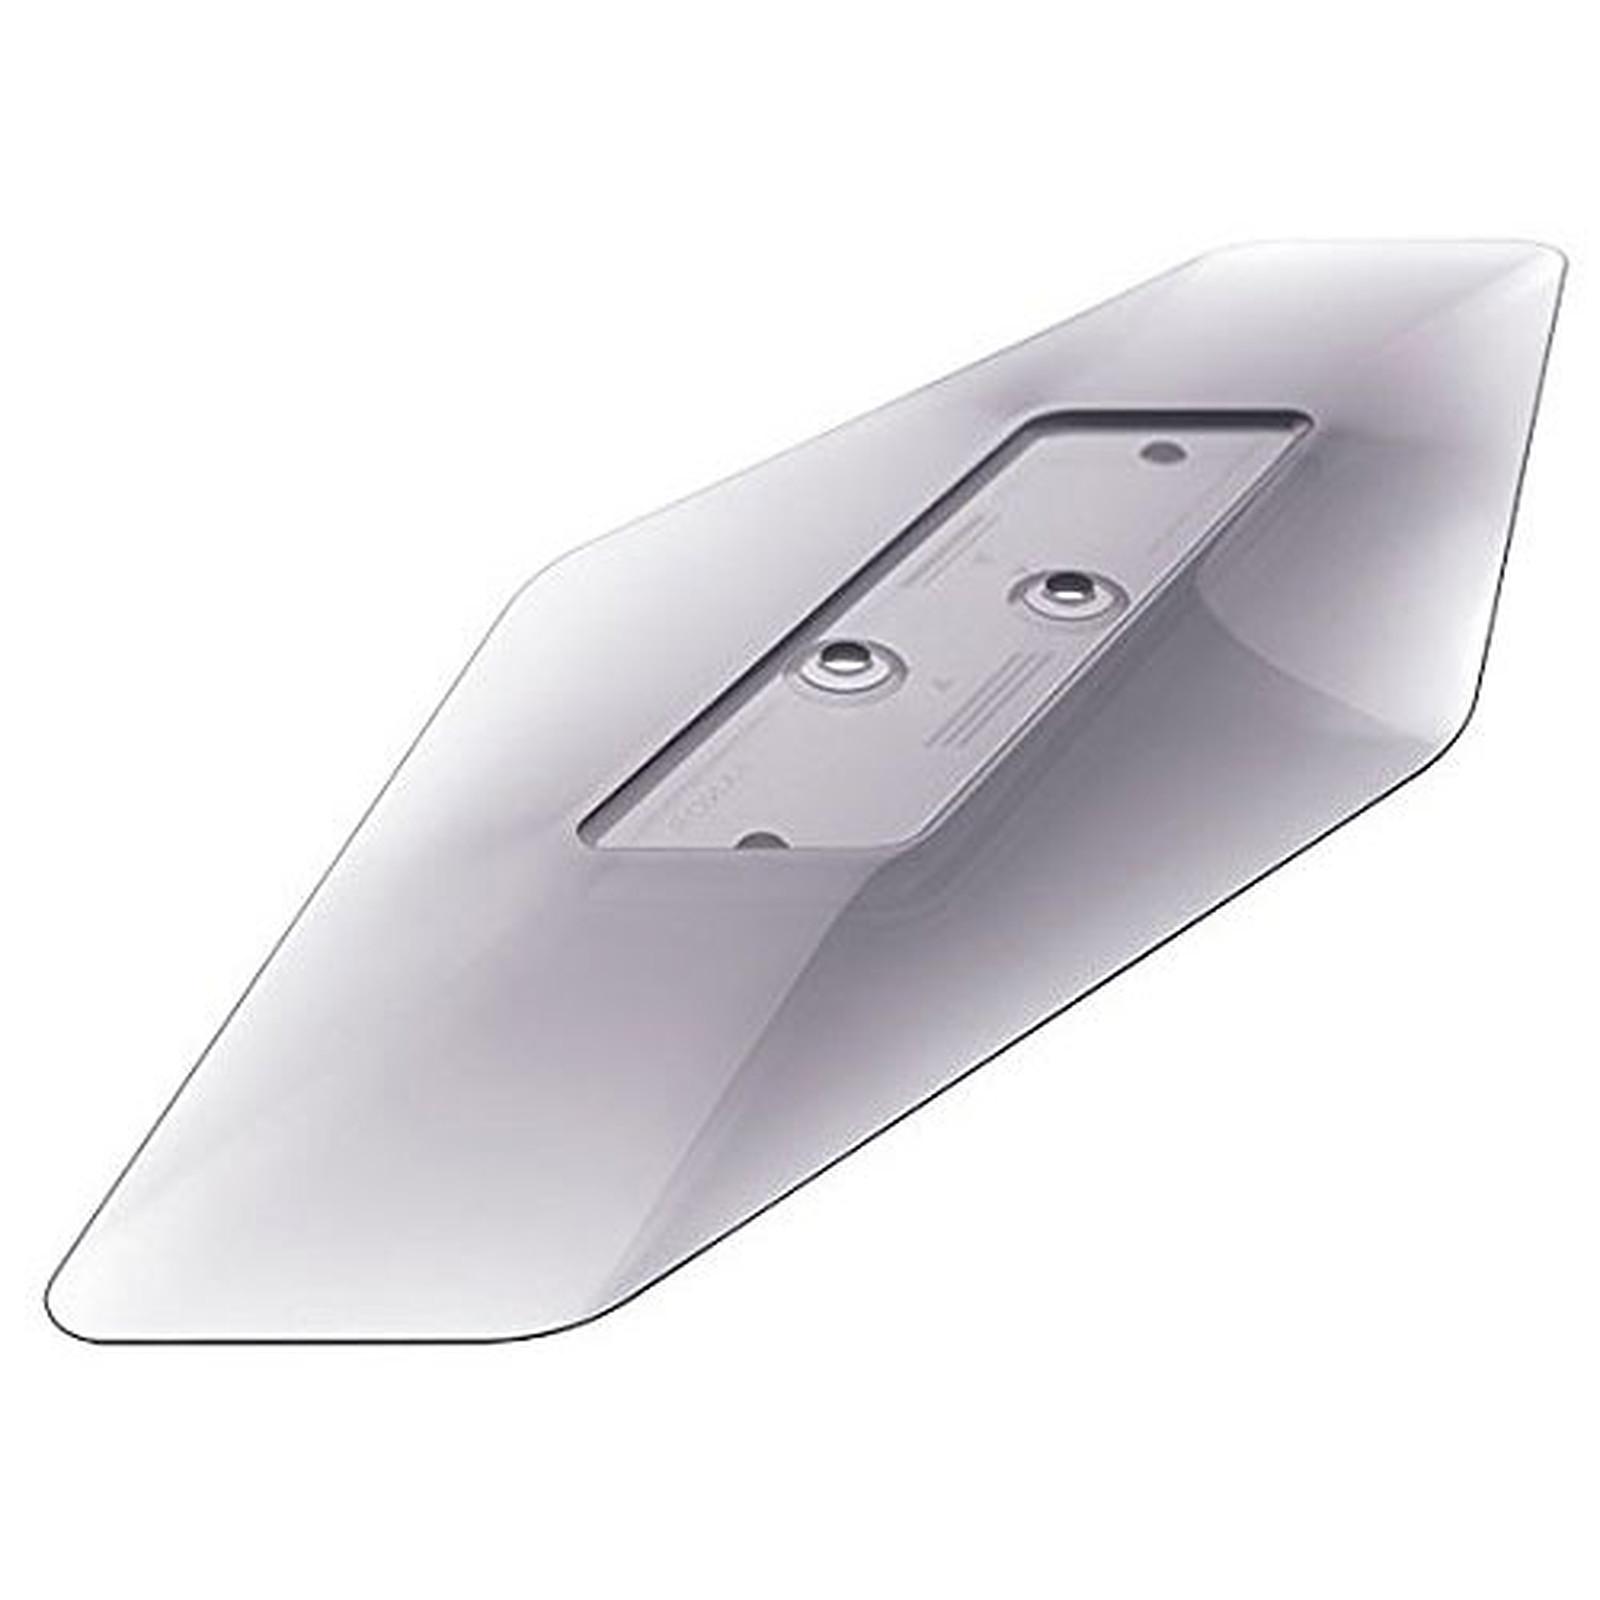 Sony présentoir verdeical Blanco (PS4 Slim)